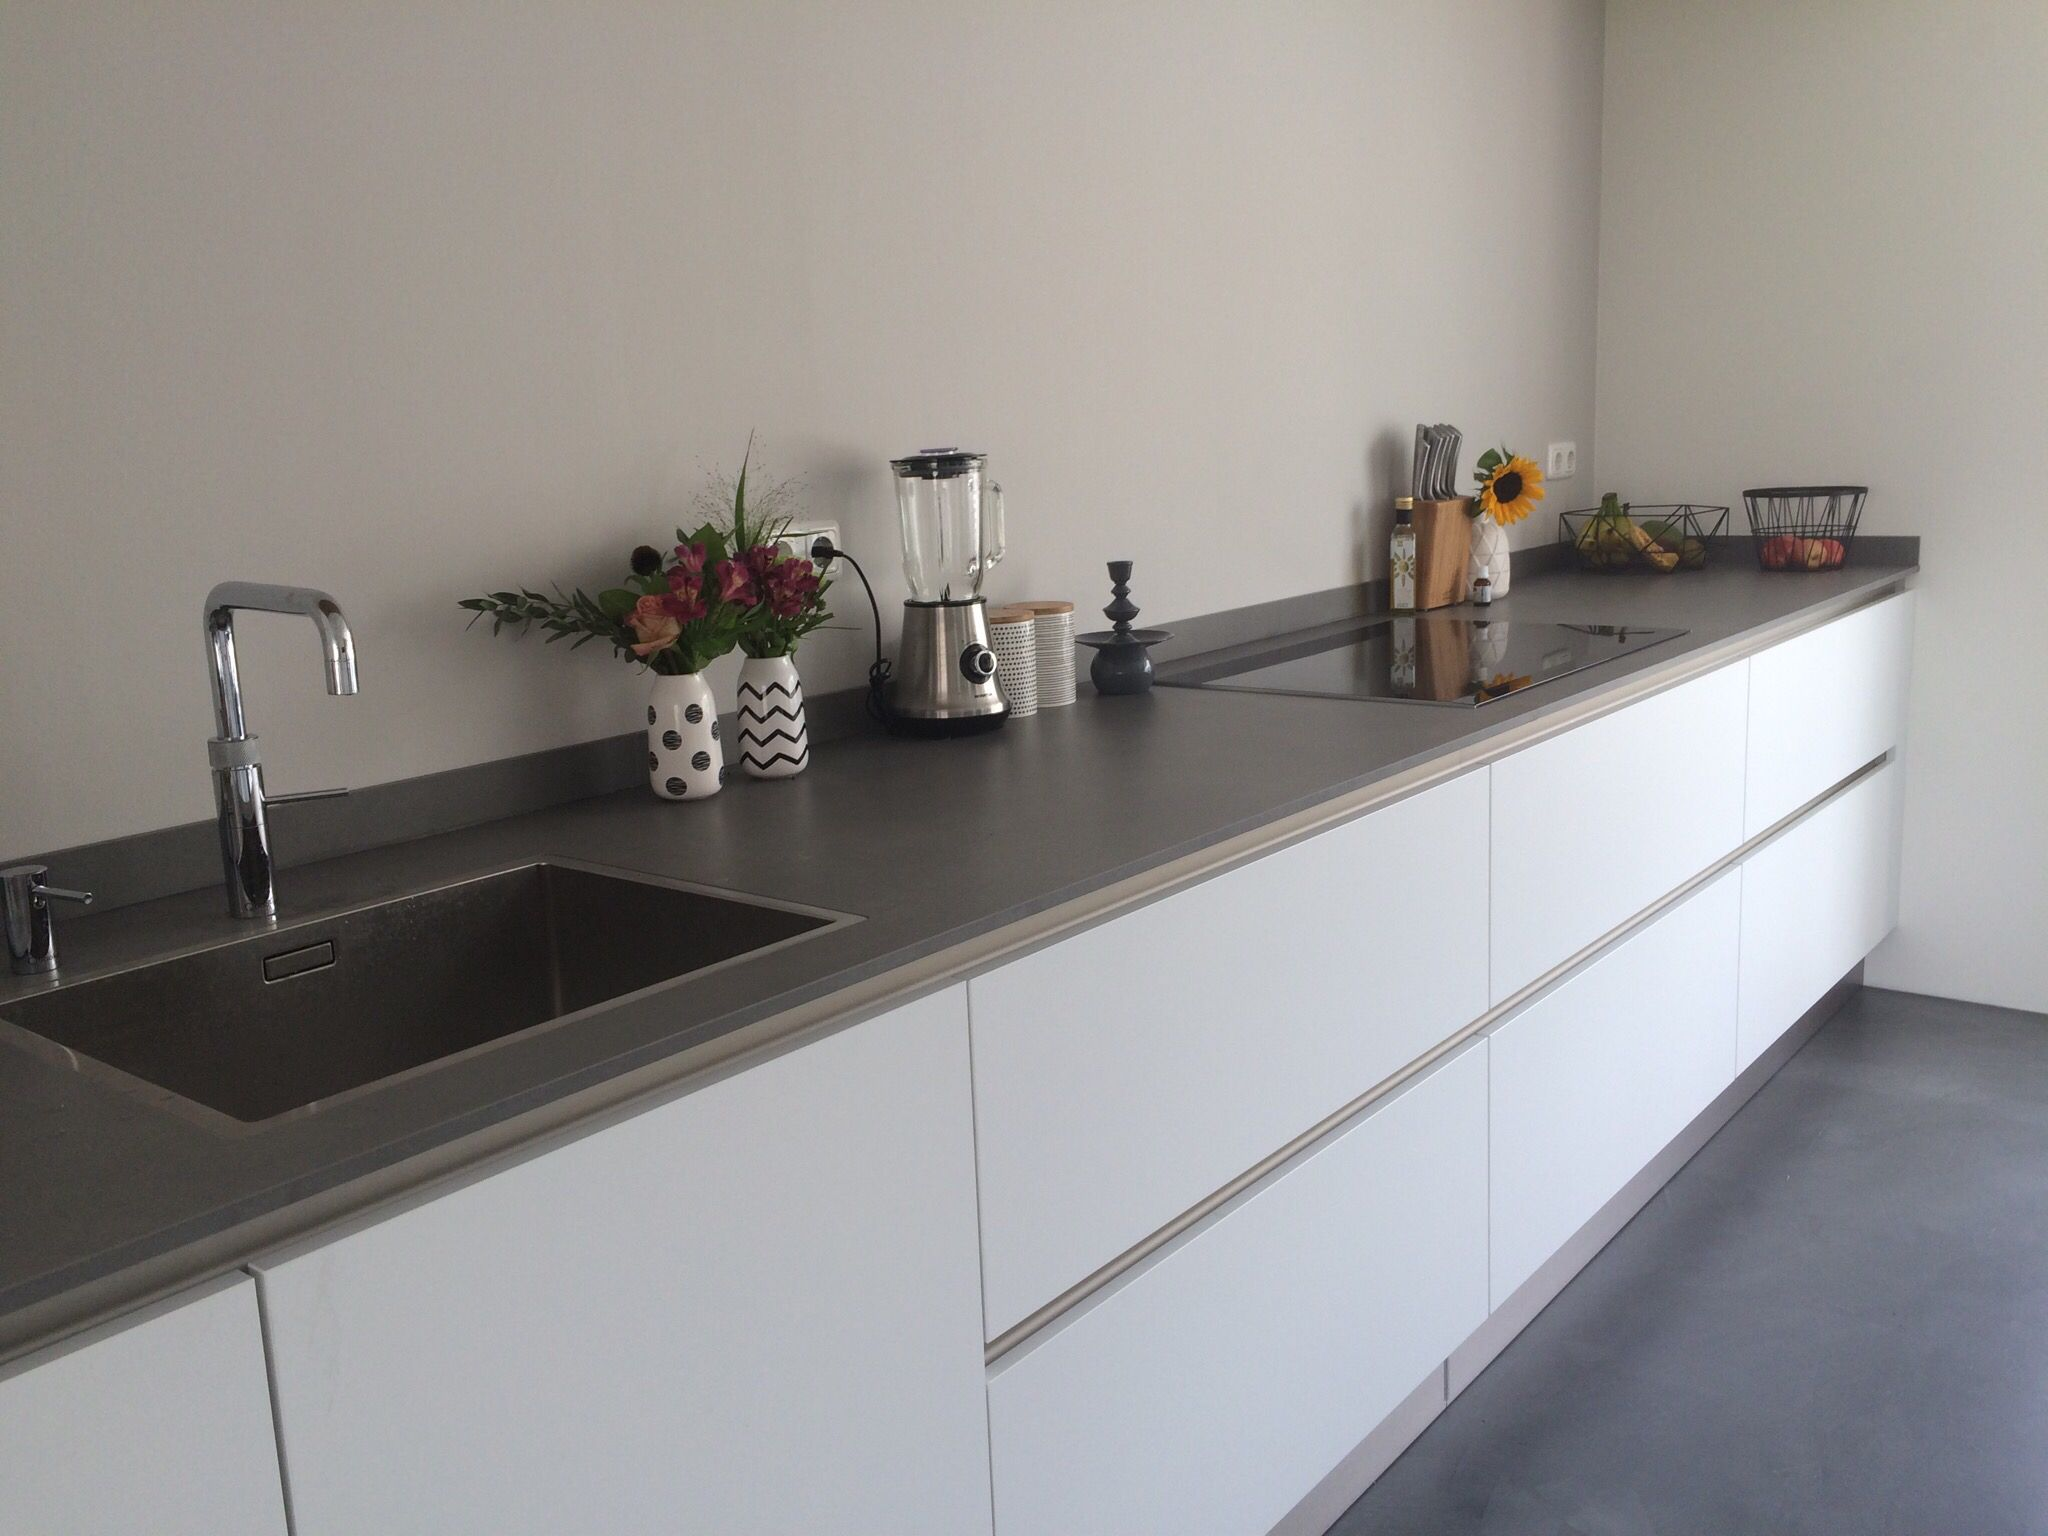 Strakke Witte Keuken : Stijlvolle strakke keukens vindt u bij keukenmaxx